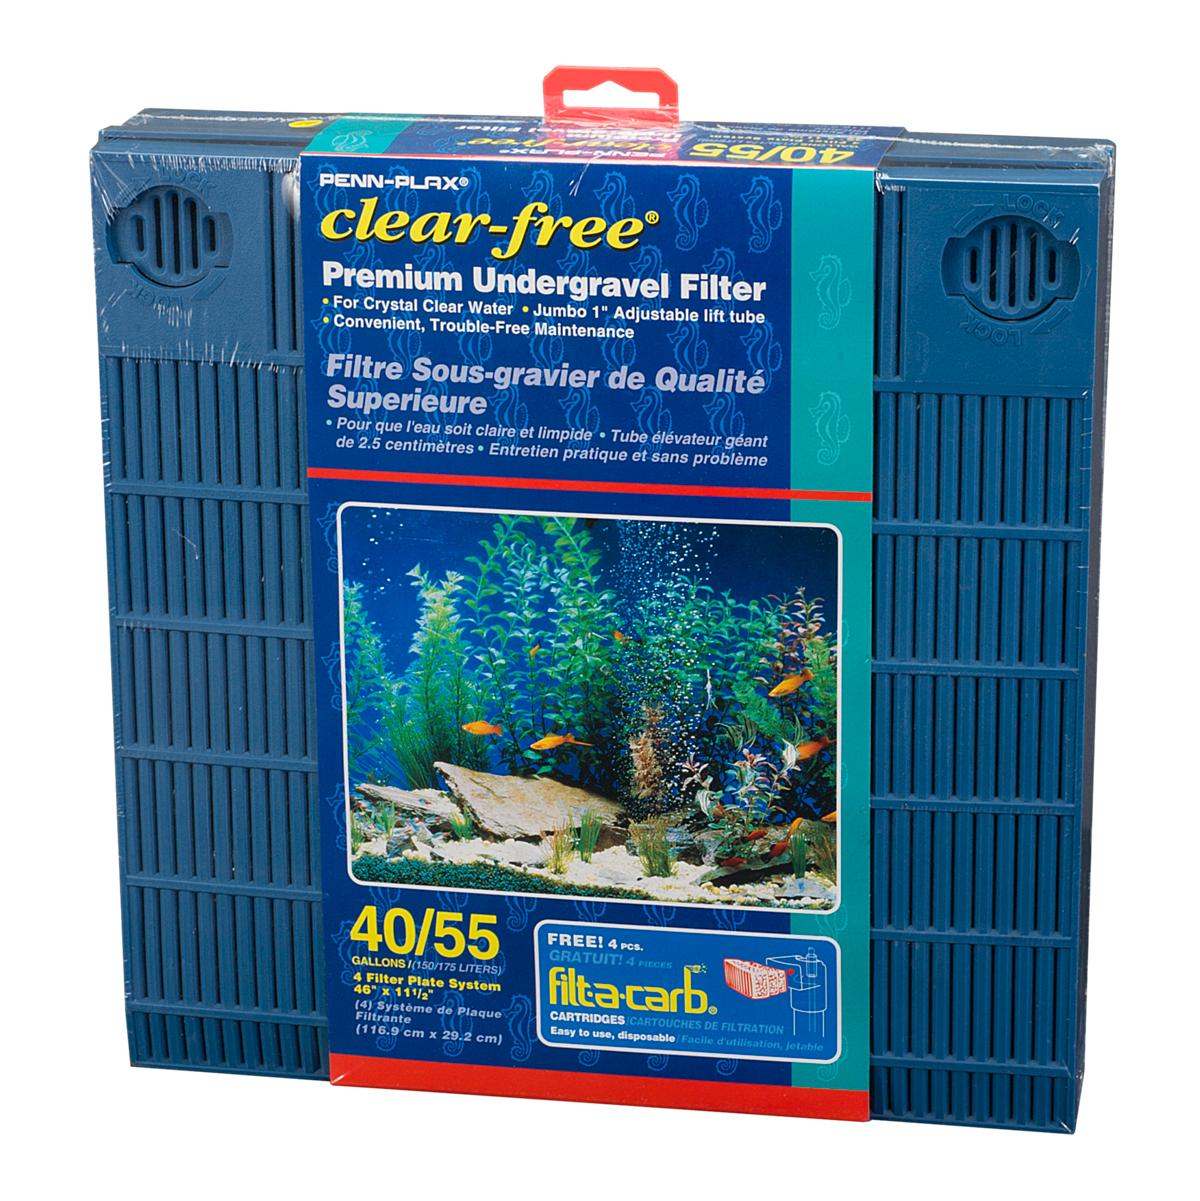 Penn plax premium under gravel filter 20 gallon amazon for Fish tank bottom filter